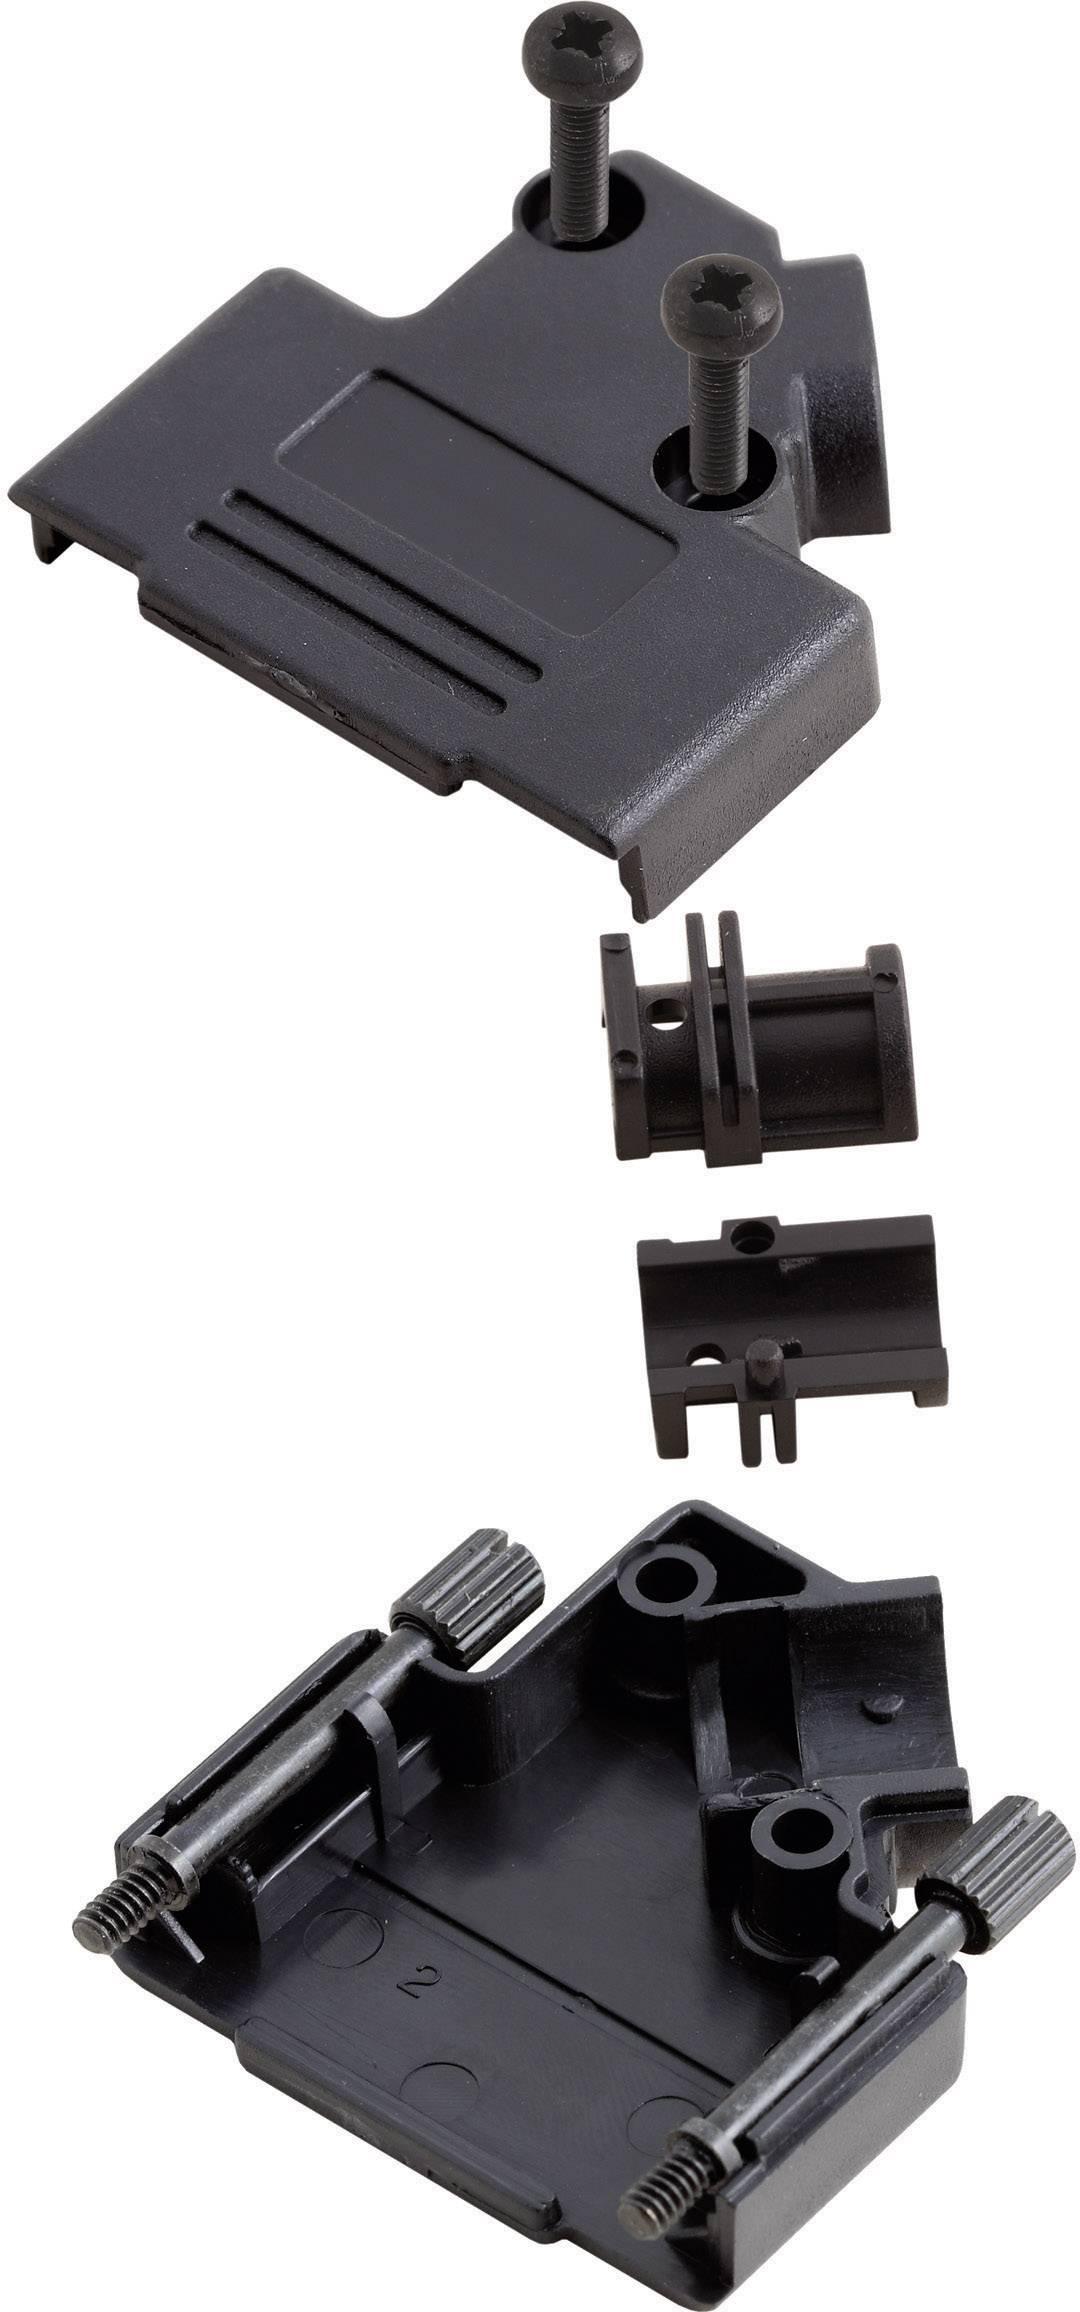 D-SUB púzdro MH Connectors MHD45PPK-25-BK-K 6560-0107-13, počet pinov: 25, plast, 45 °, čierna, 1 ks